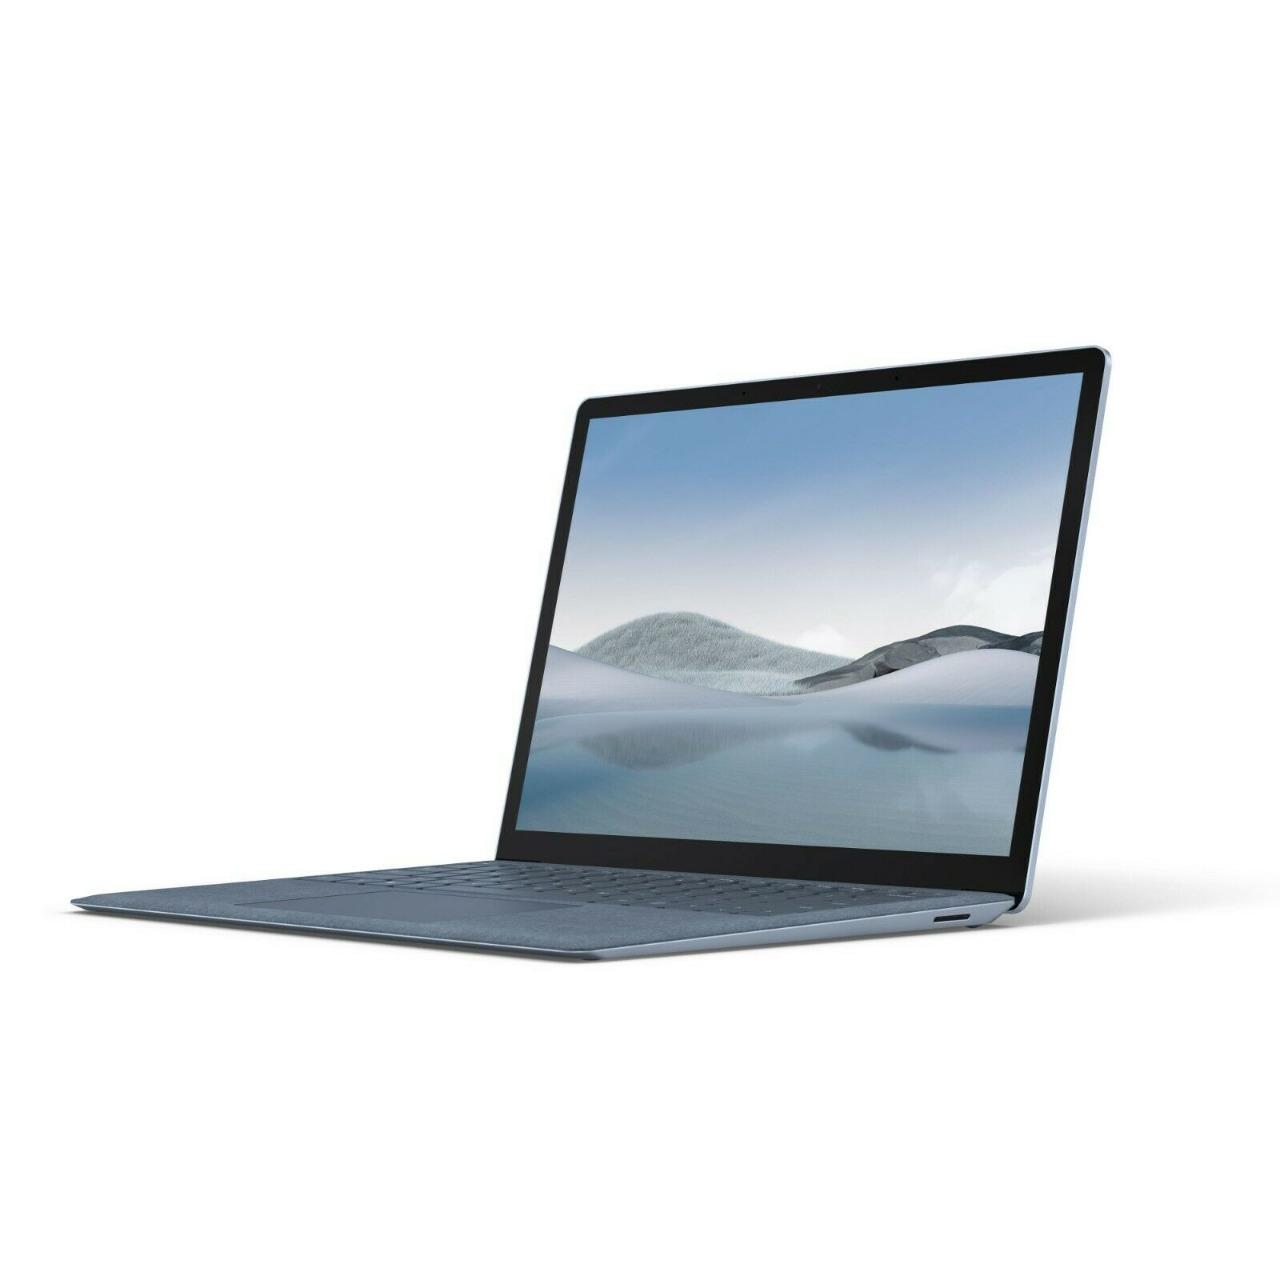 Microsoft Surface Laptop 4 13.5 Core i7 16GB RAM 512GB SSD Ice Blue